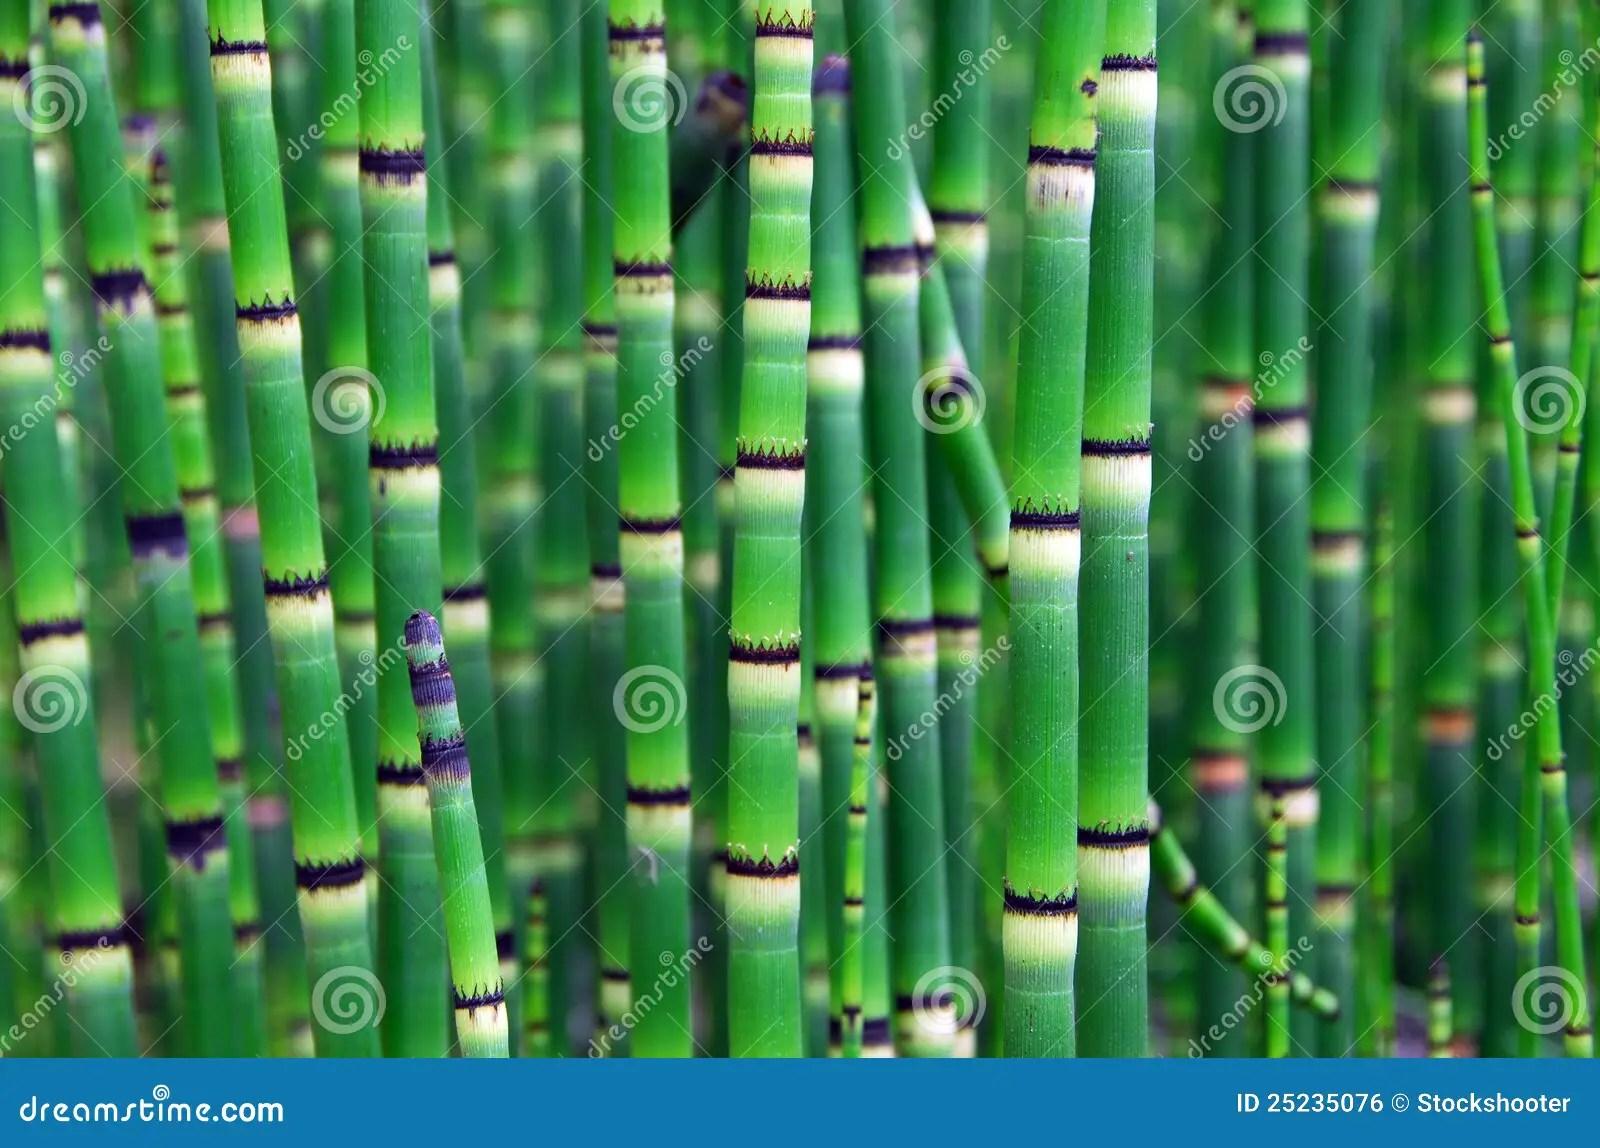 horsetail plant diagram emg 81 85 wiring 2 volume 1 tone fern anatomy elsavadorla